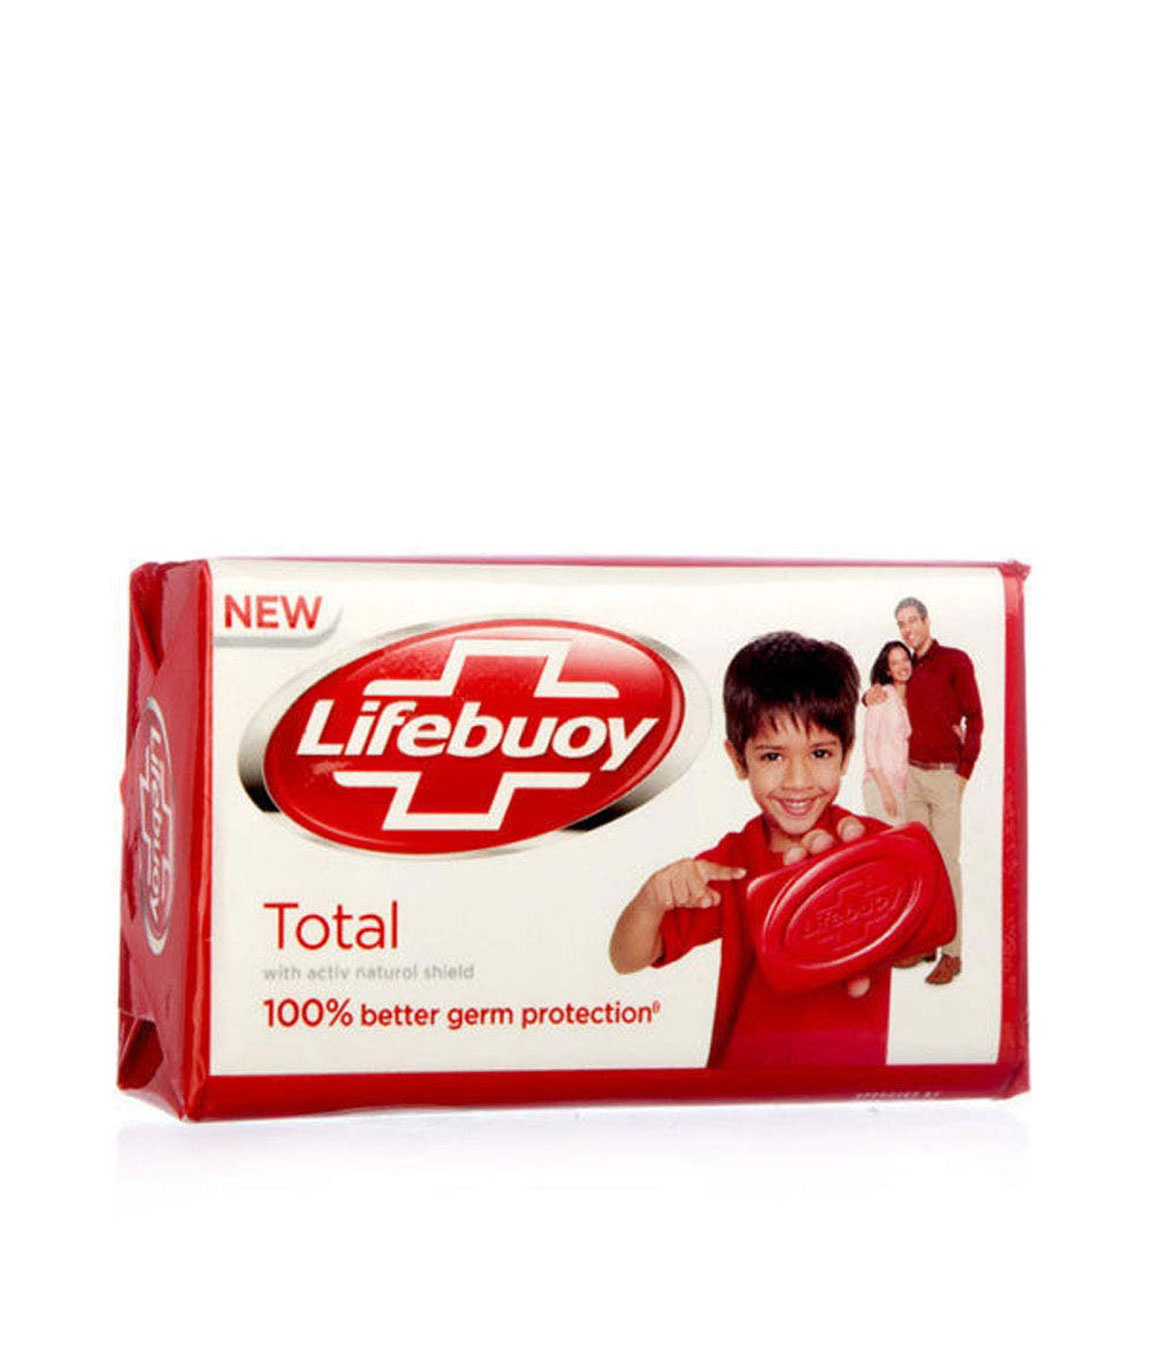 Lifebuoy Total 10 Soap Bar (125 gm) - Pack of 12